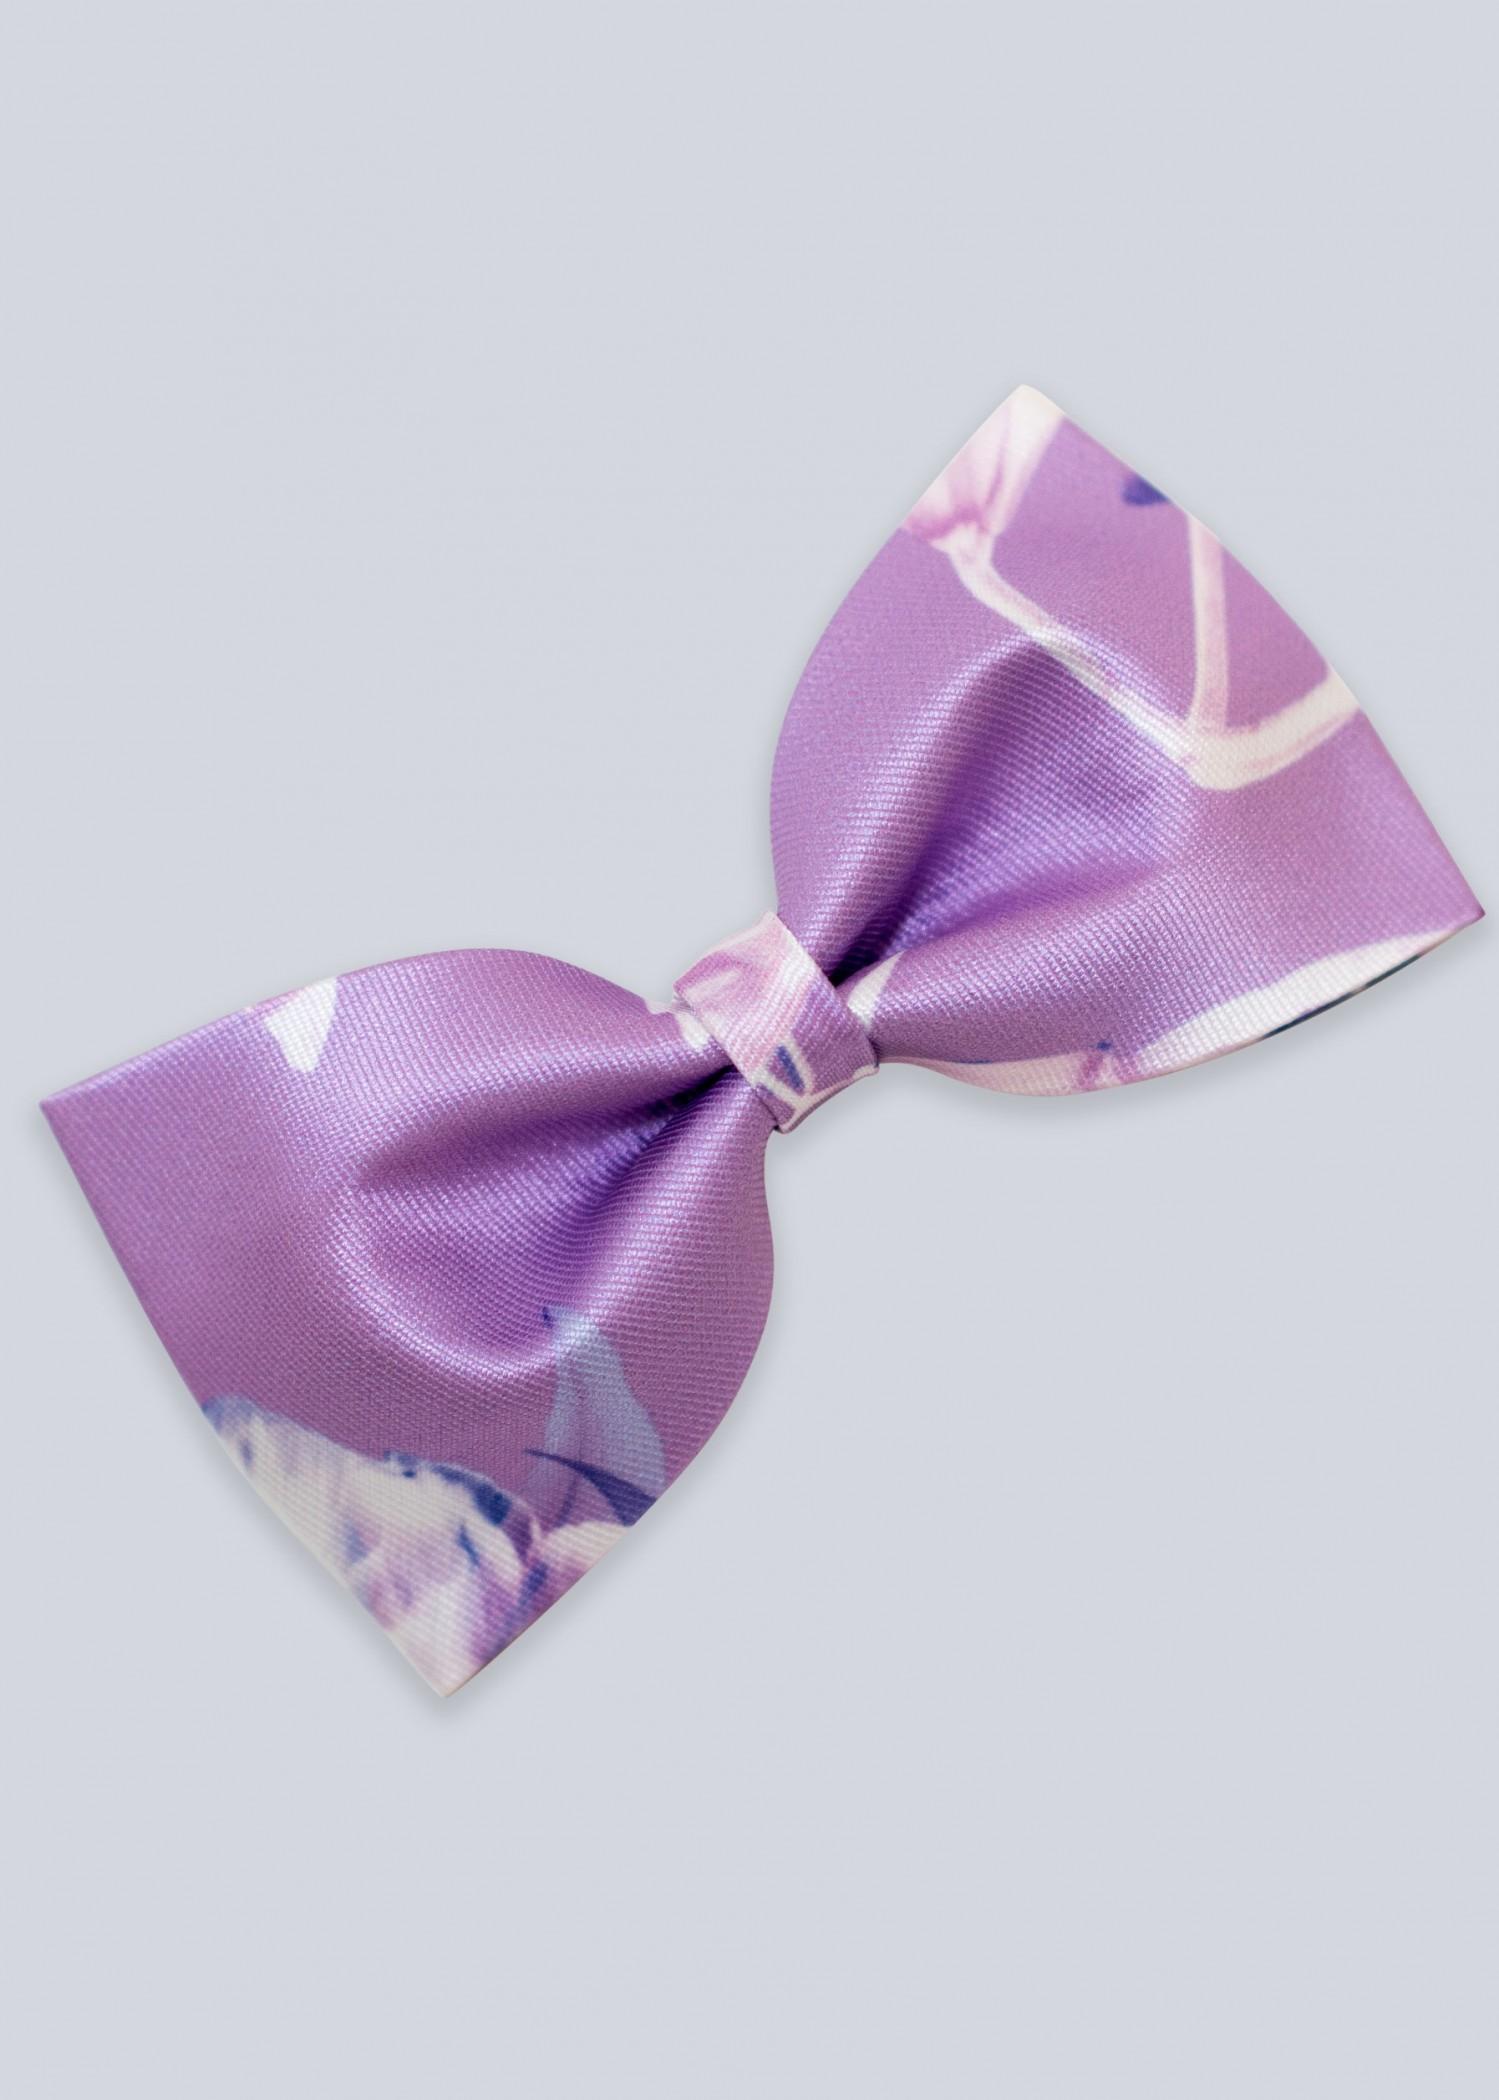 Ellie Wilde EW11803B Charming Floral Print Bow Tie